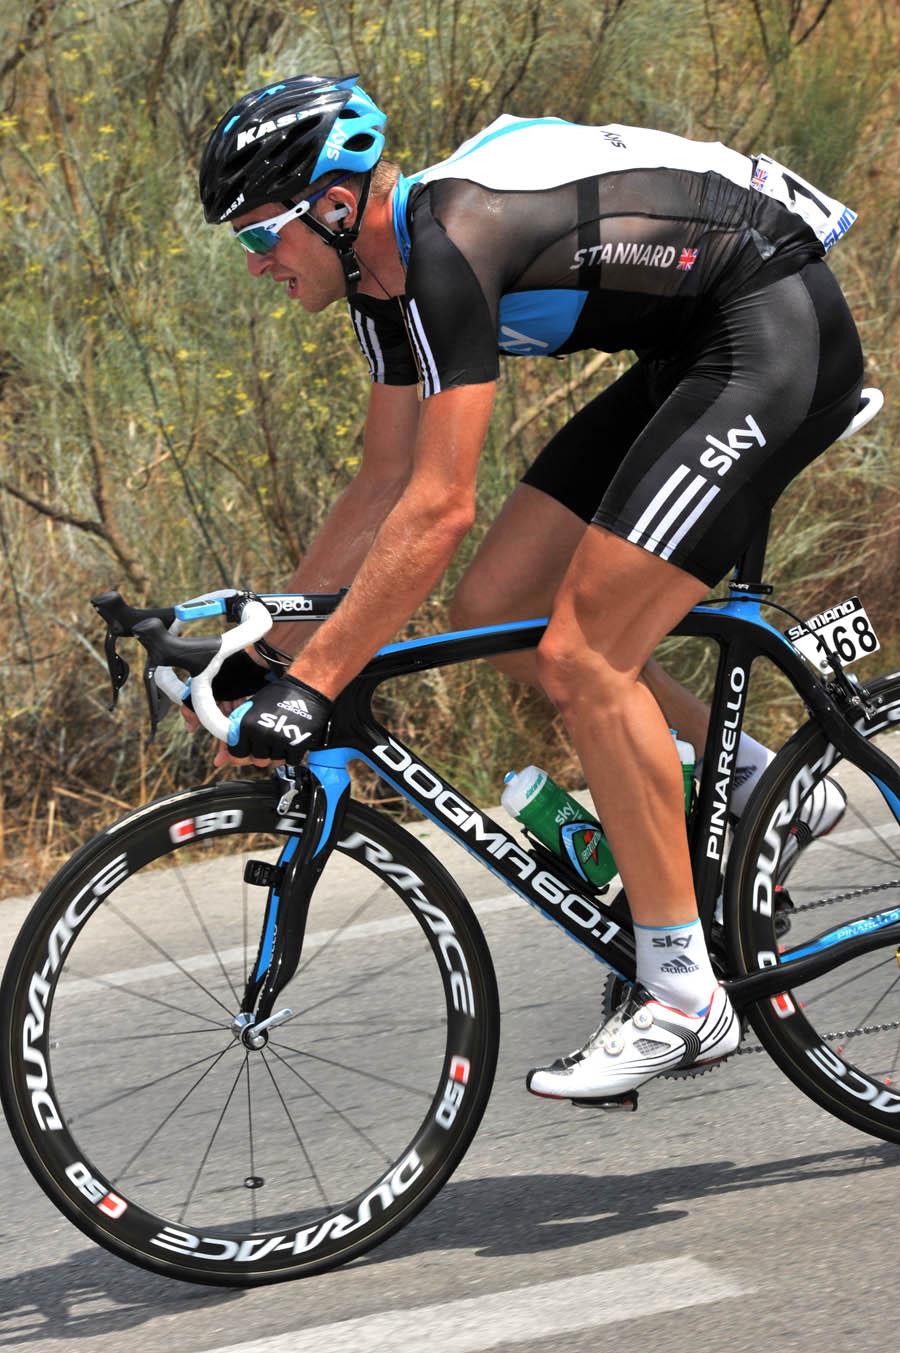 Ian Stannard, Vuelta a Espana 2010, stage four